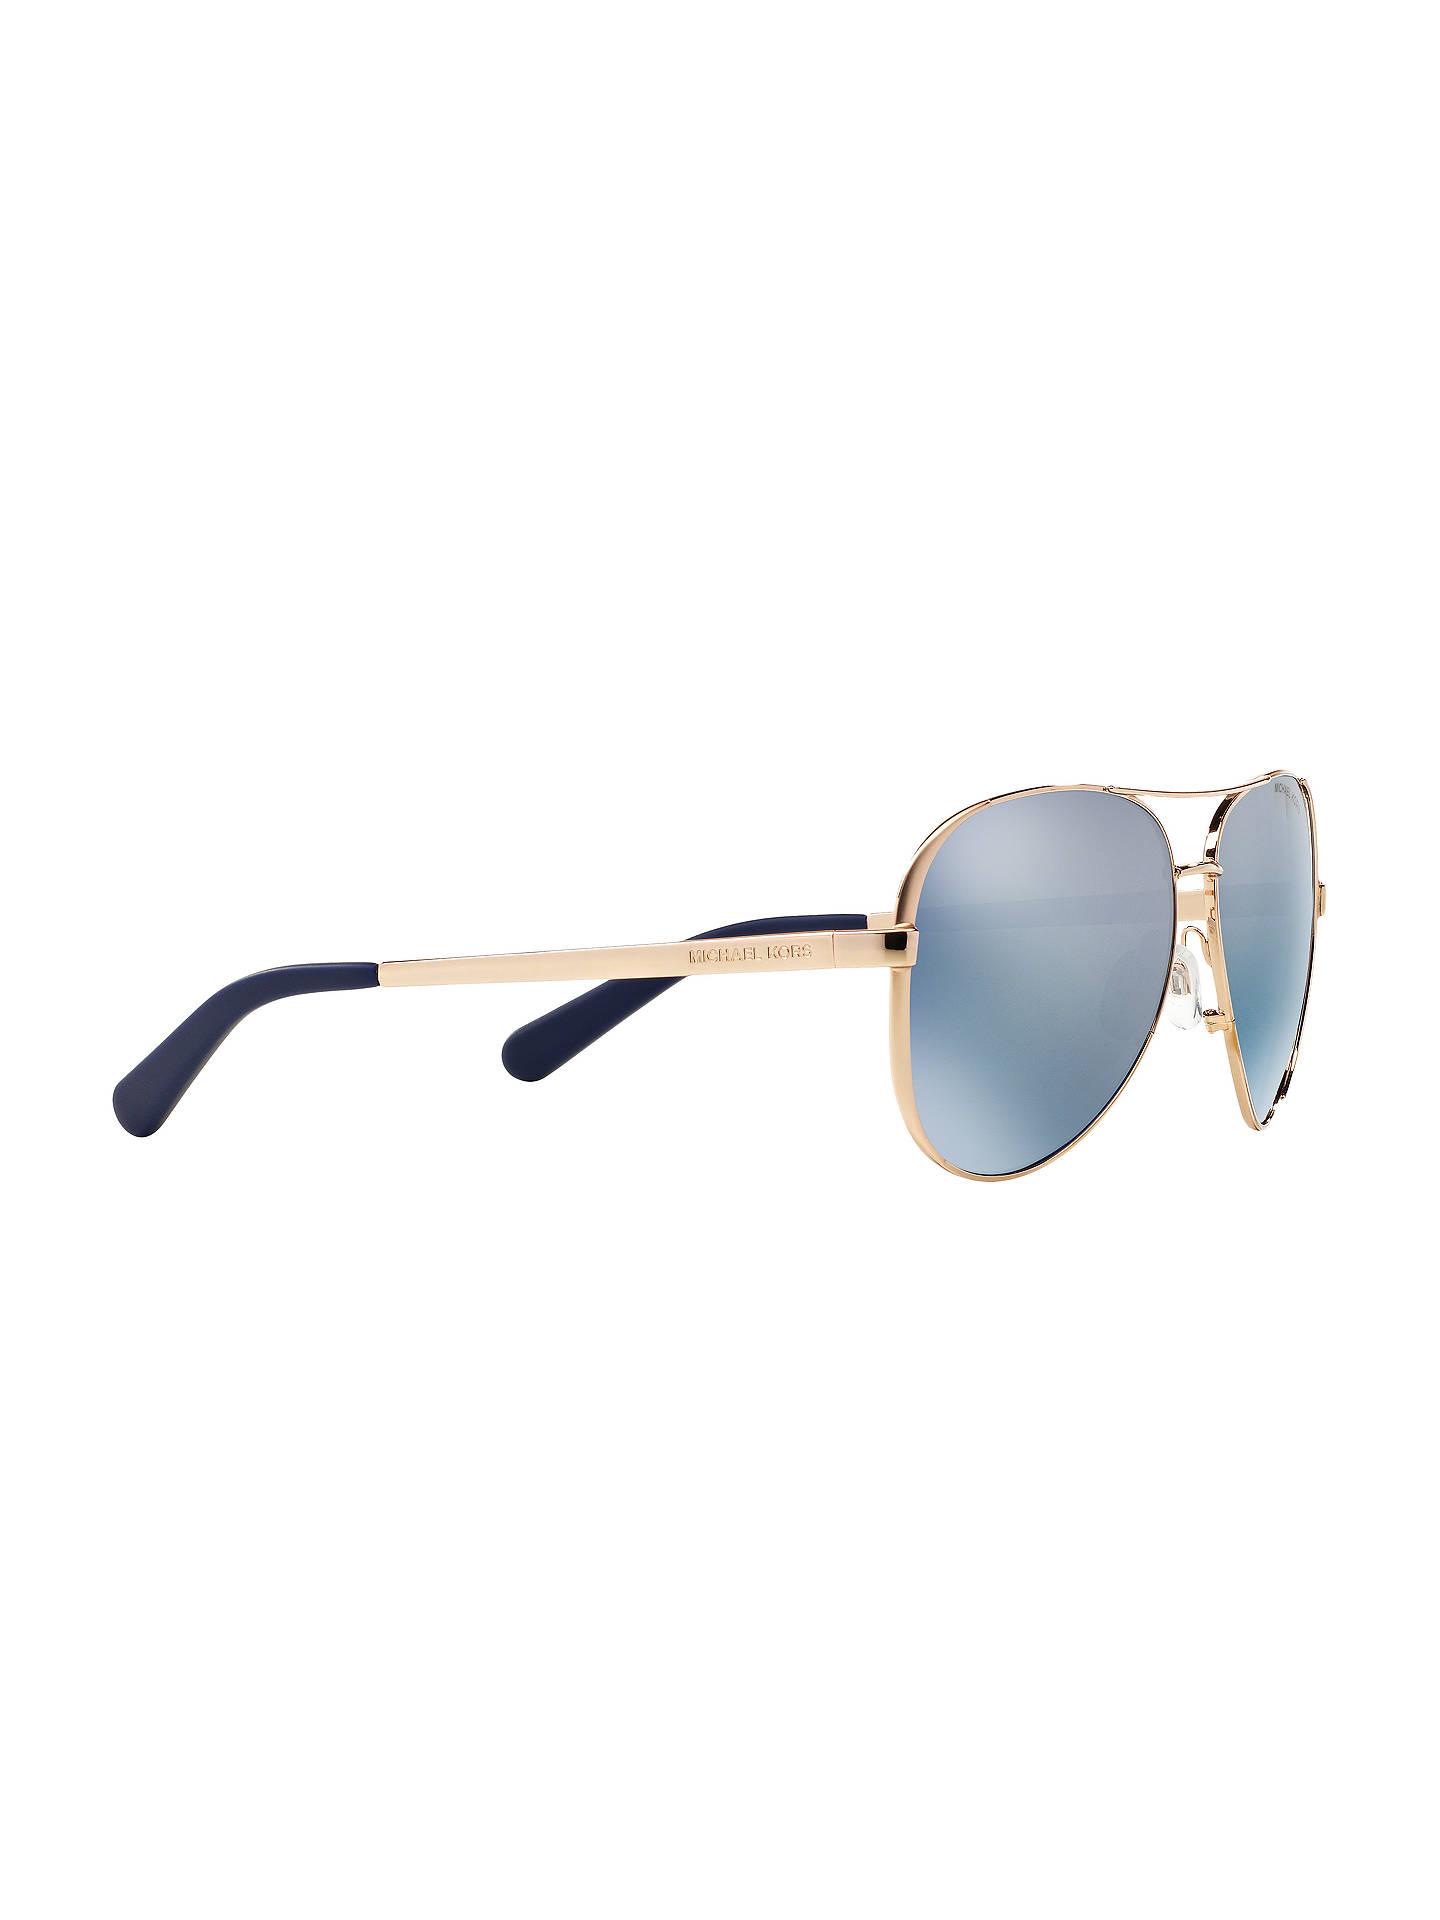 22ad5aabb5 Michael Kors MK5004 Chelsea Polarised Aviator Sunglasses at John ...